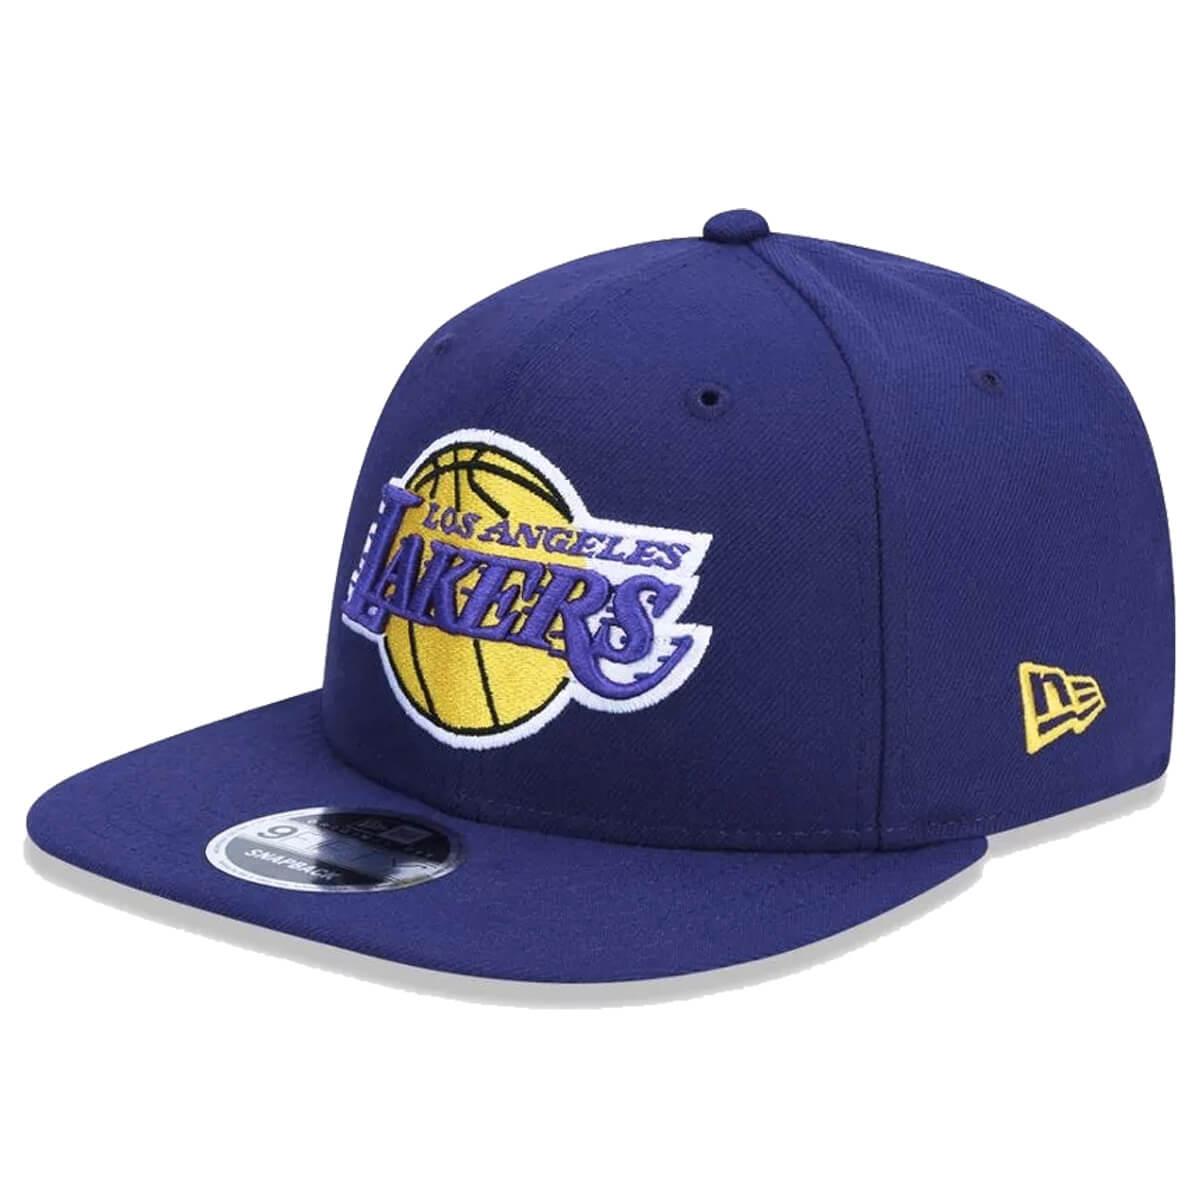 Boné New Era Aba Reta 950 SN NBA Lakers Team Color